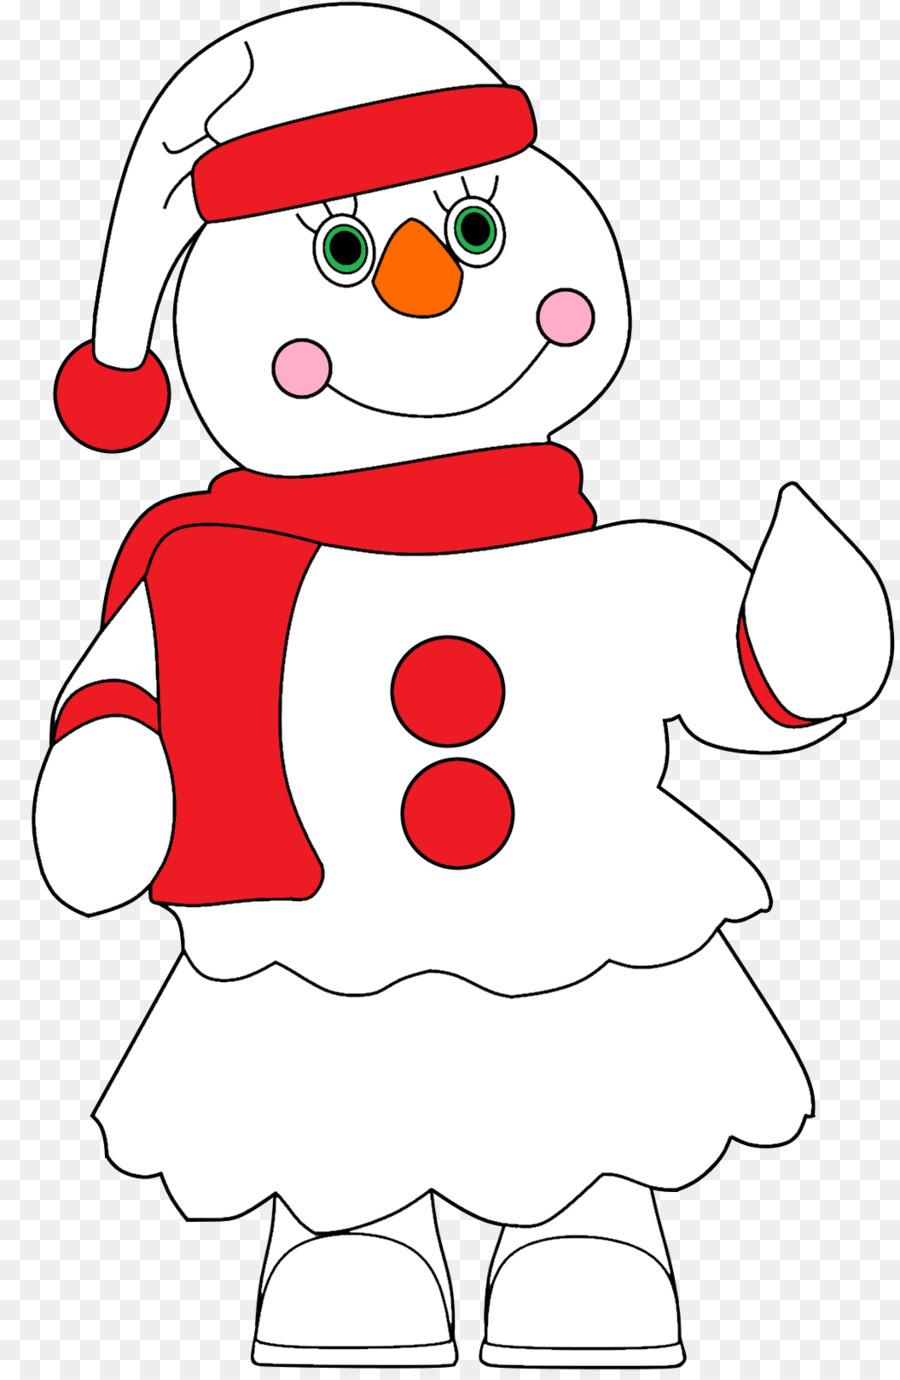 DeviantArt Christmas Artist Clip art - Shiver png download - 1055 ...